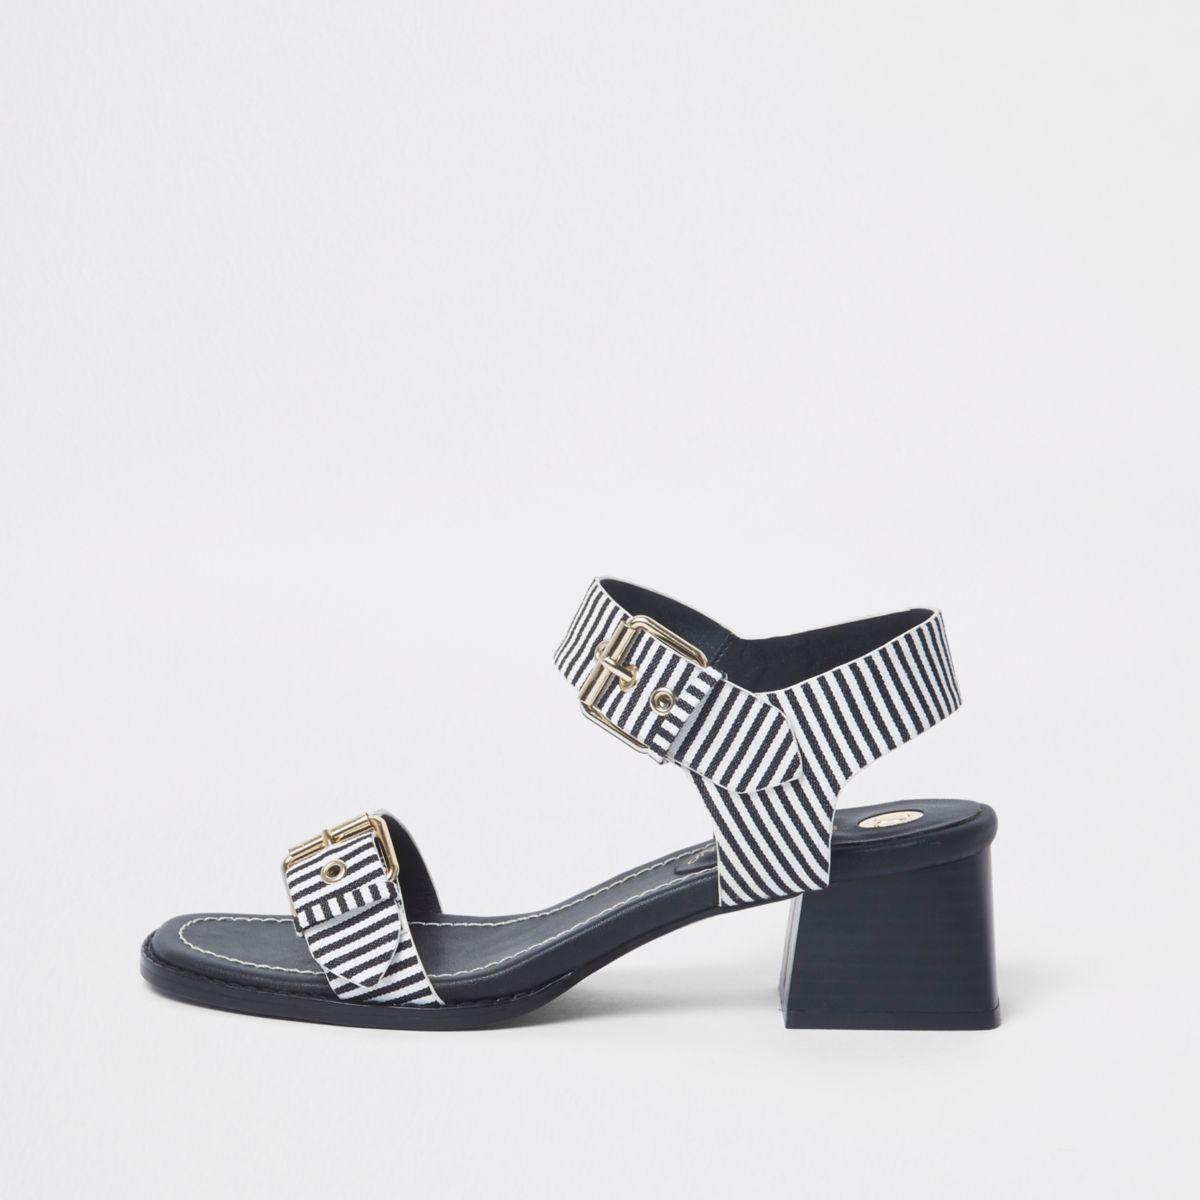 Marineblauwe gestreepte tweedelige sandalen met blokhak